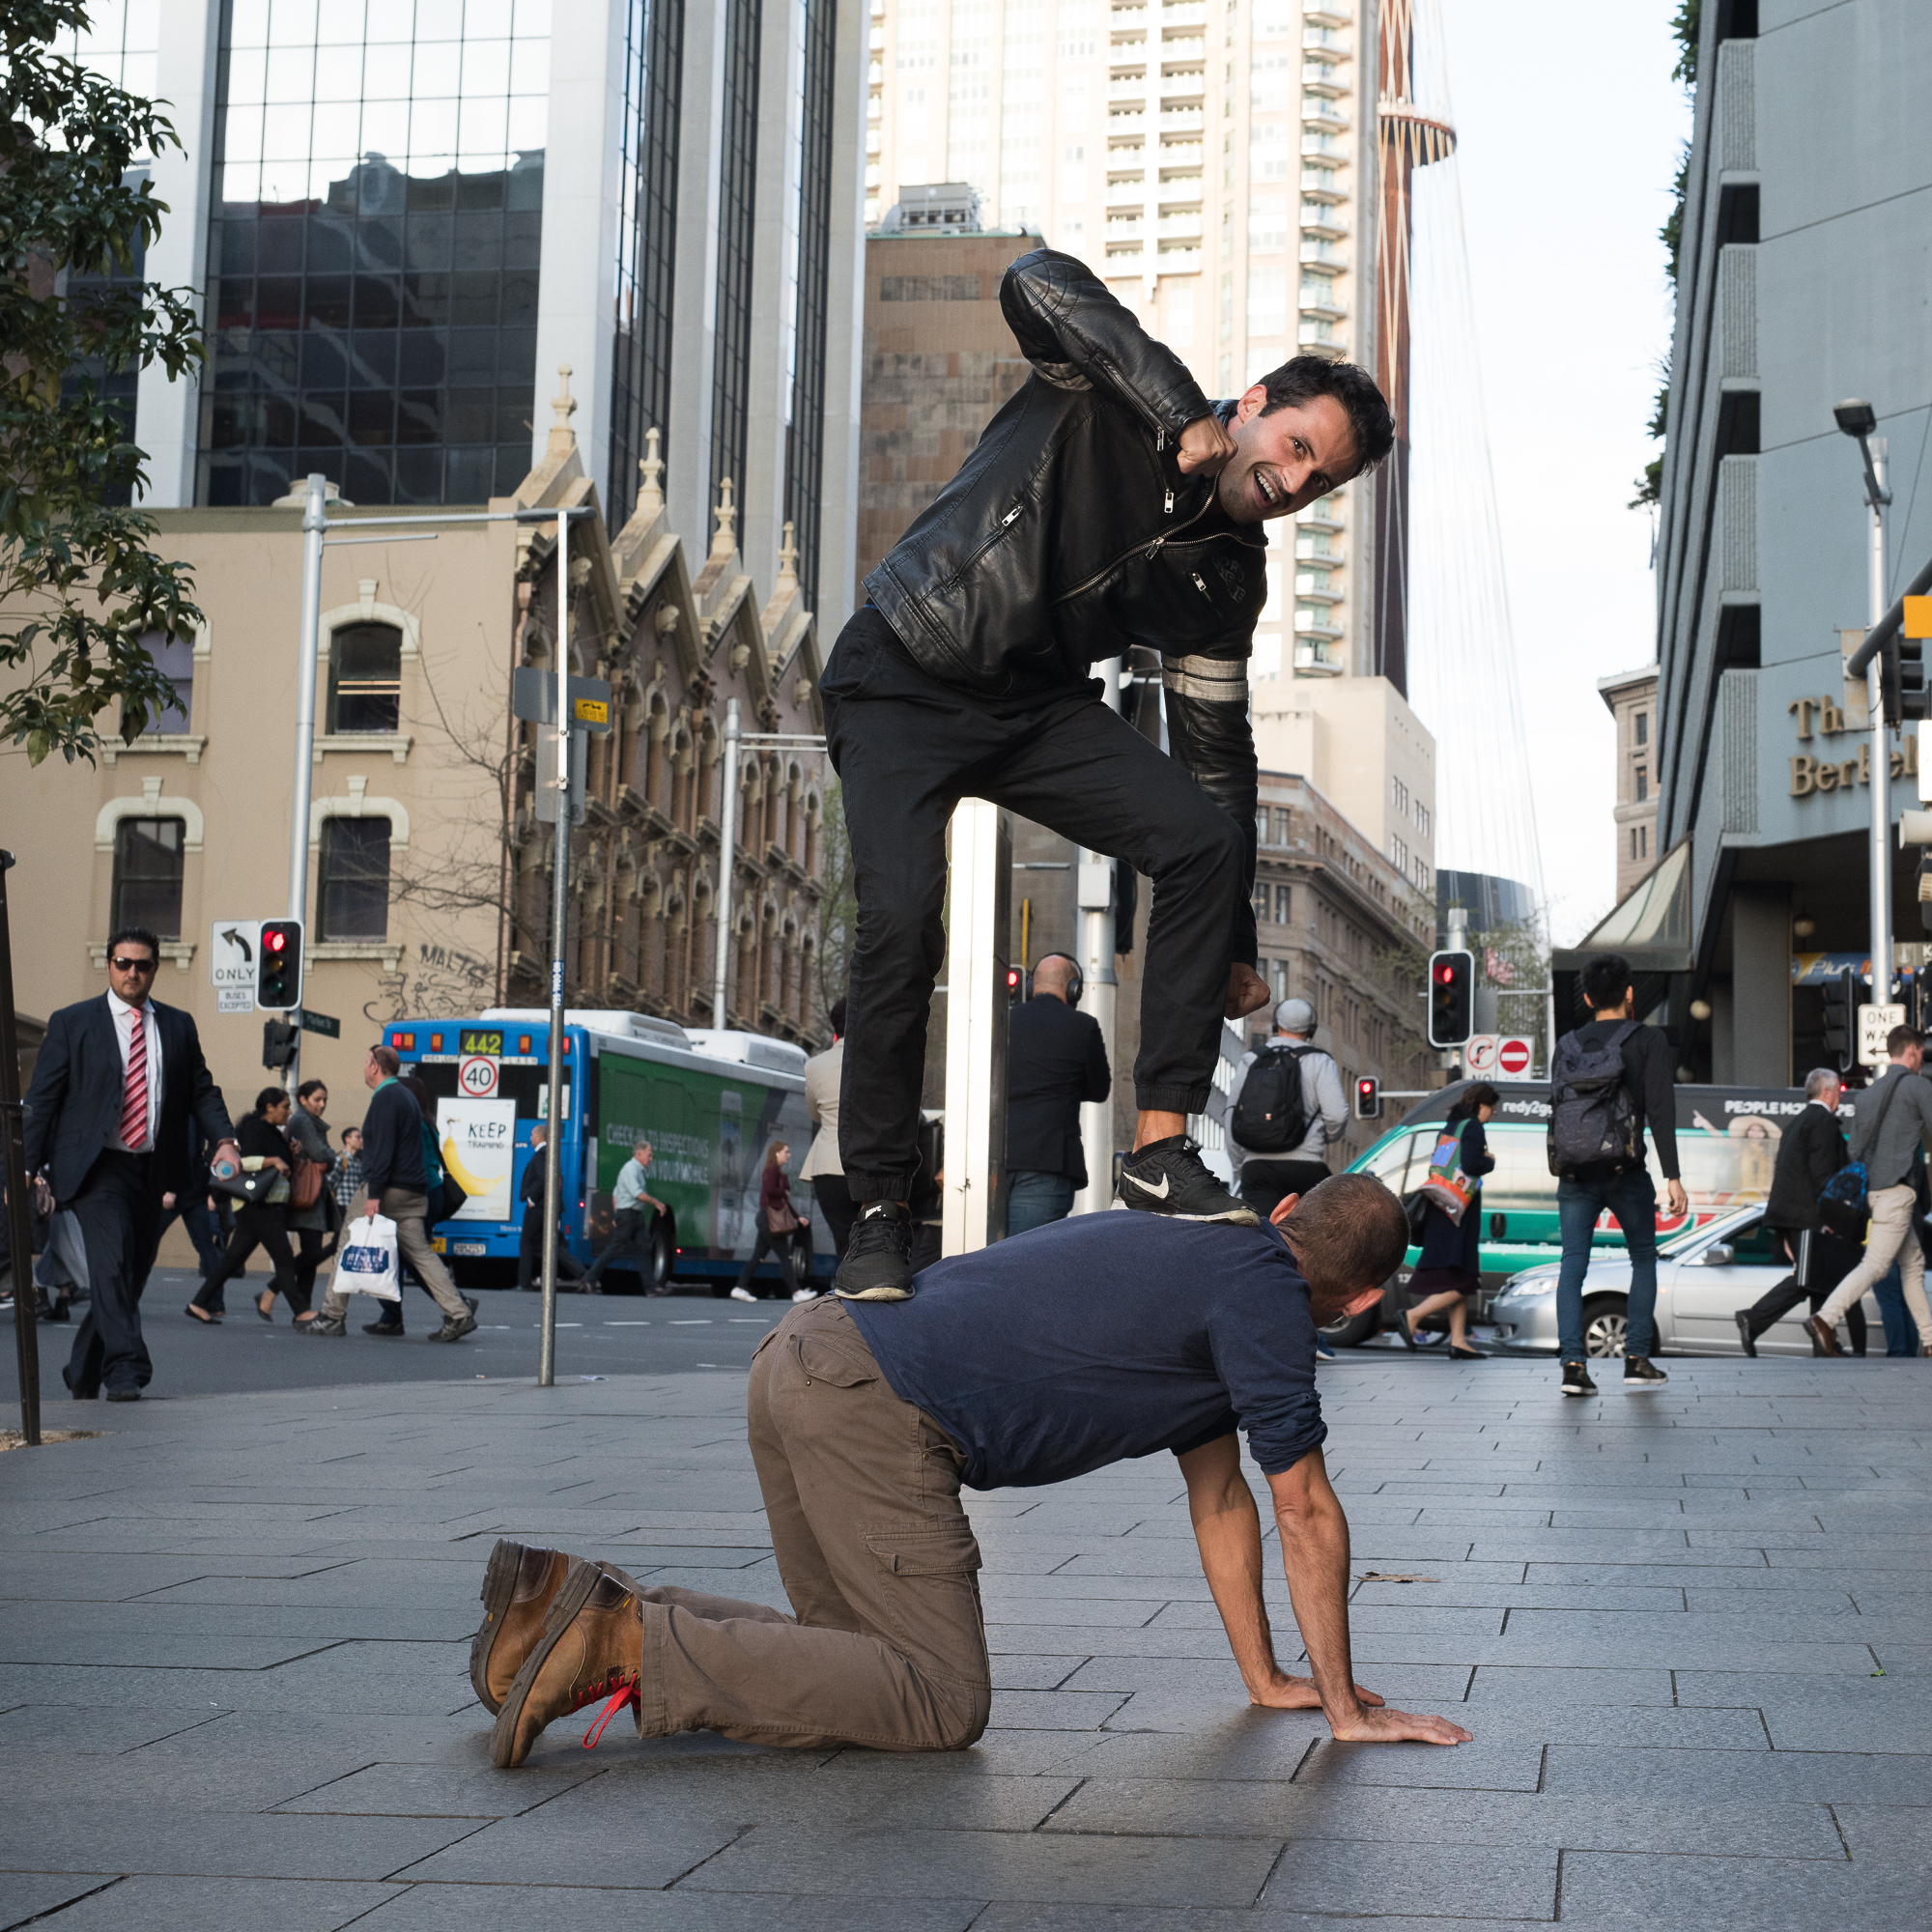 Street Sydney - With men in black